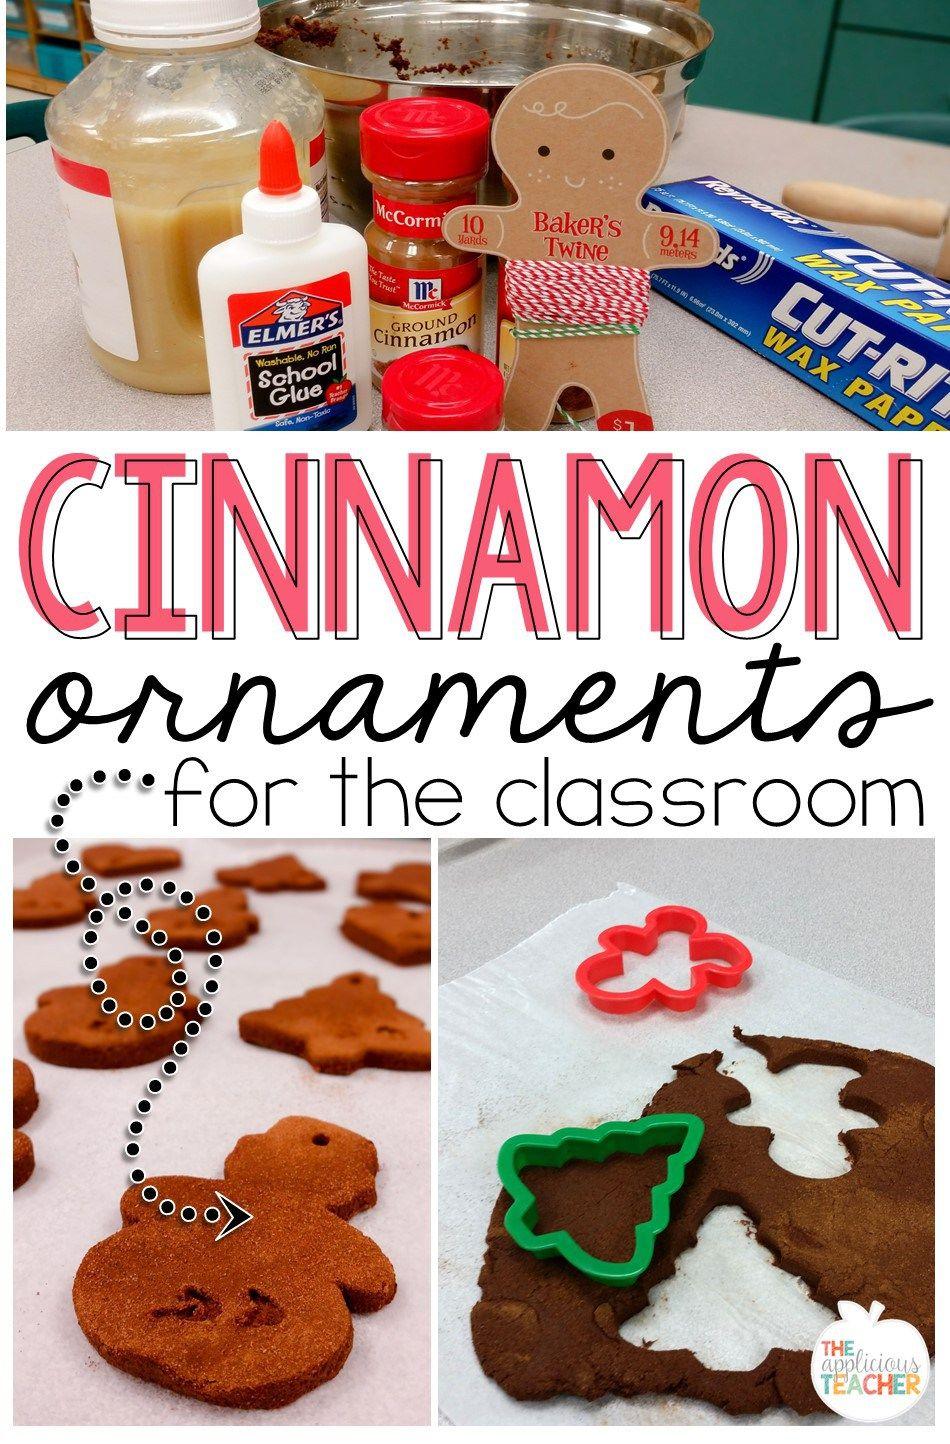 Cinnamon Ornaments For The Classroom Christmas Classroom Holiday Crafts For Kids Cinnamon Ornaments